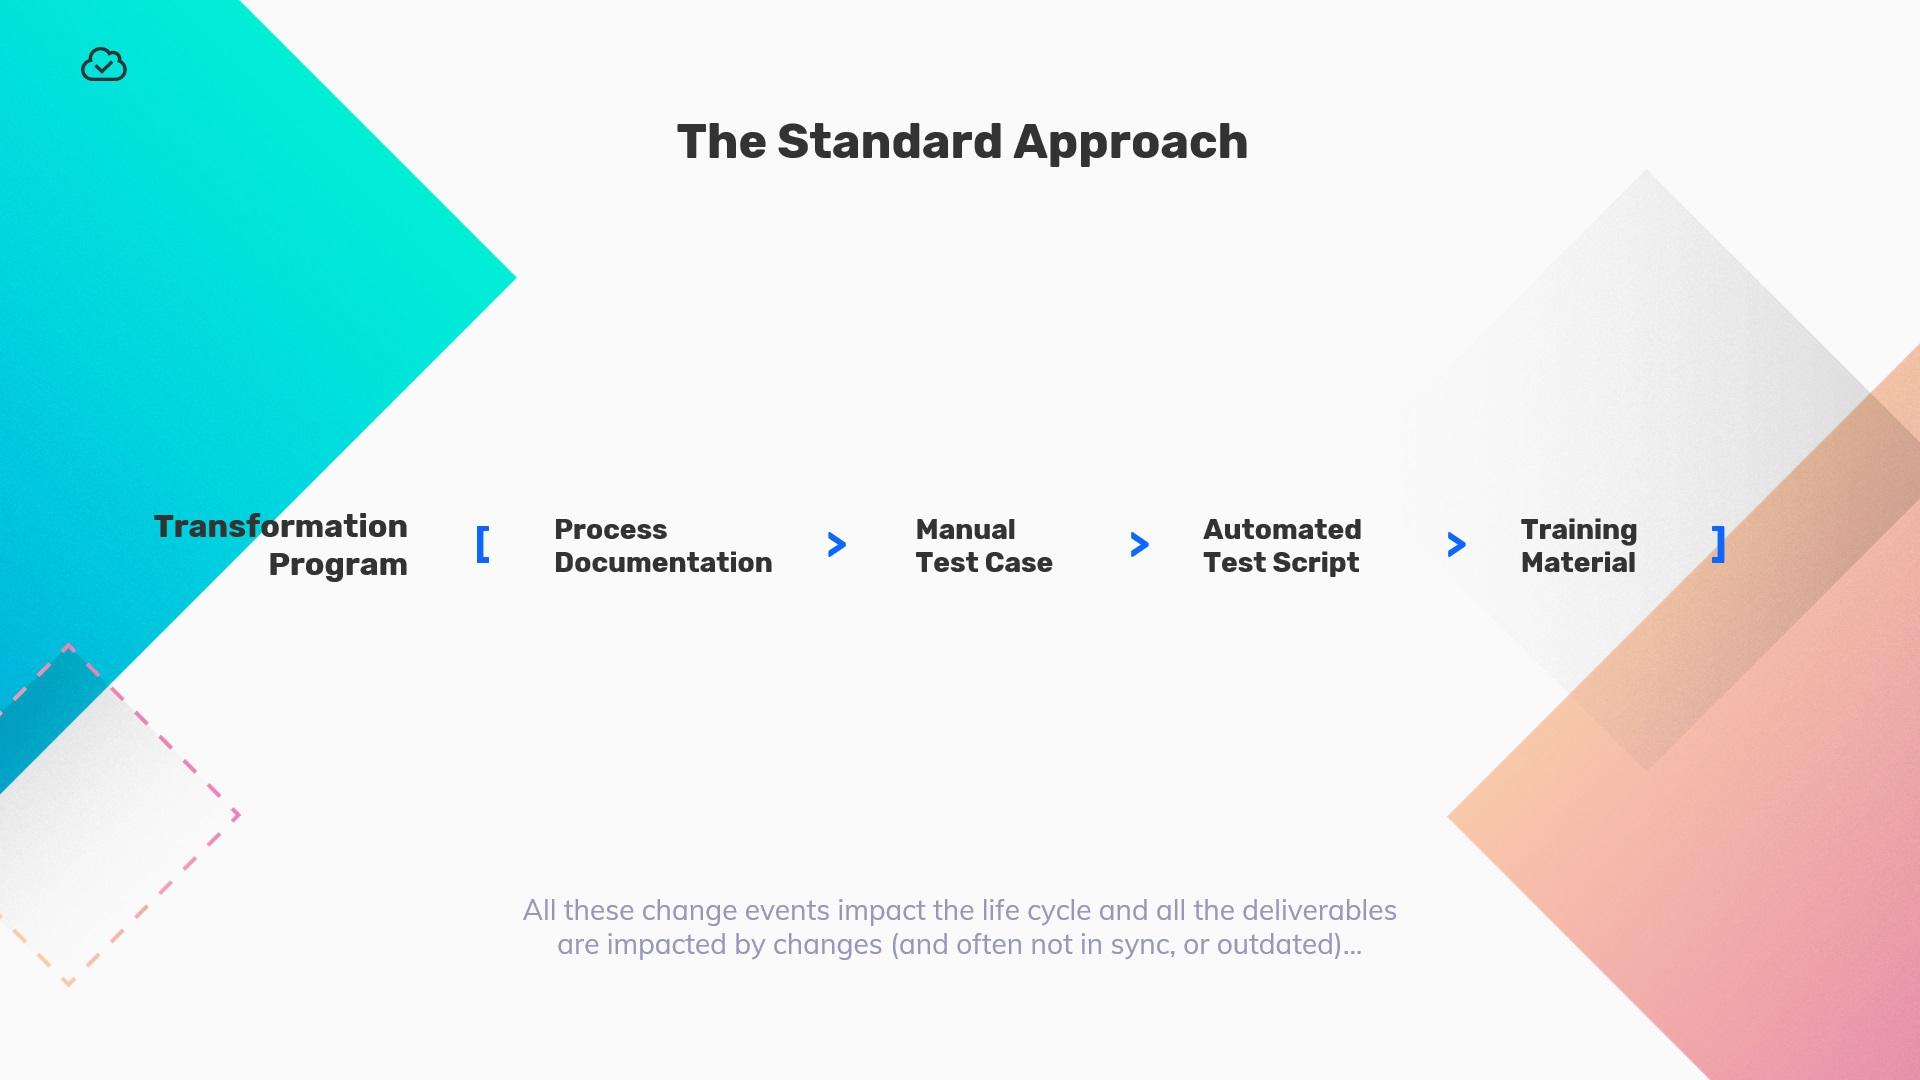 Spftware transformation program - standard approach